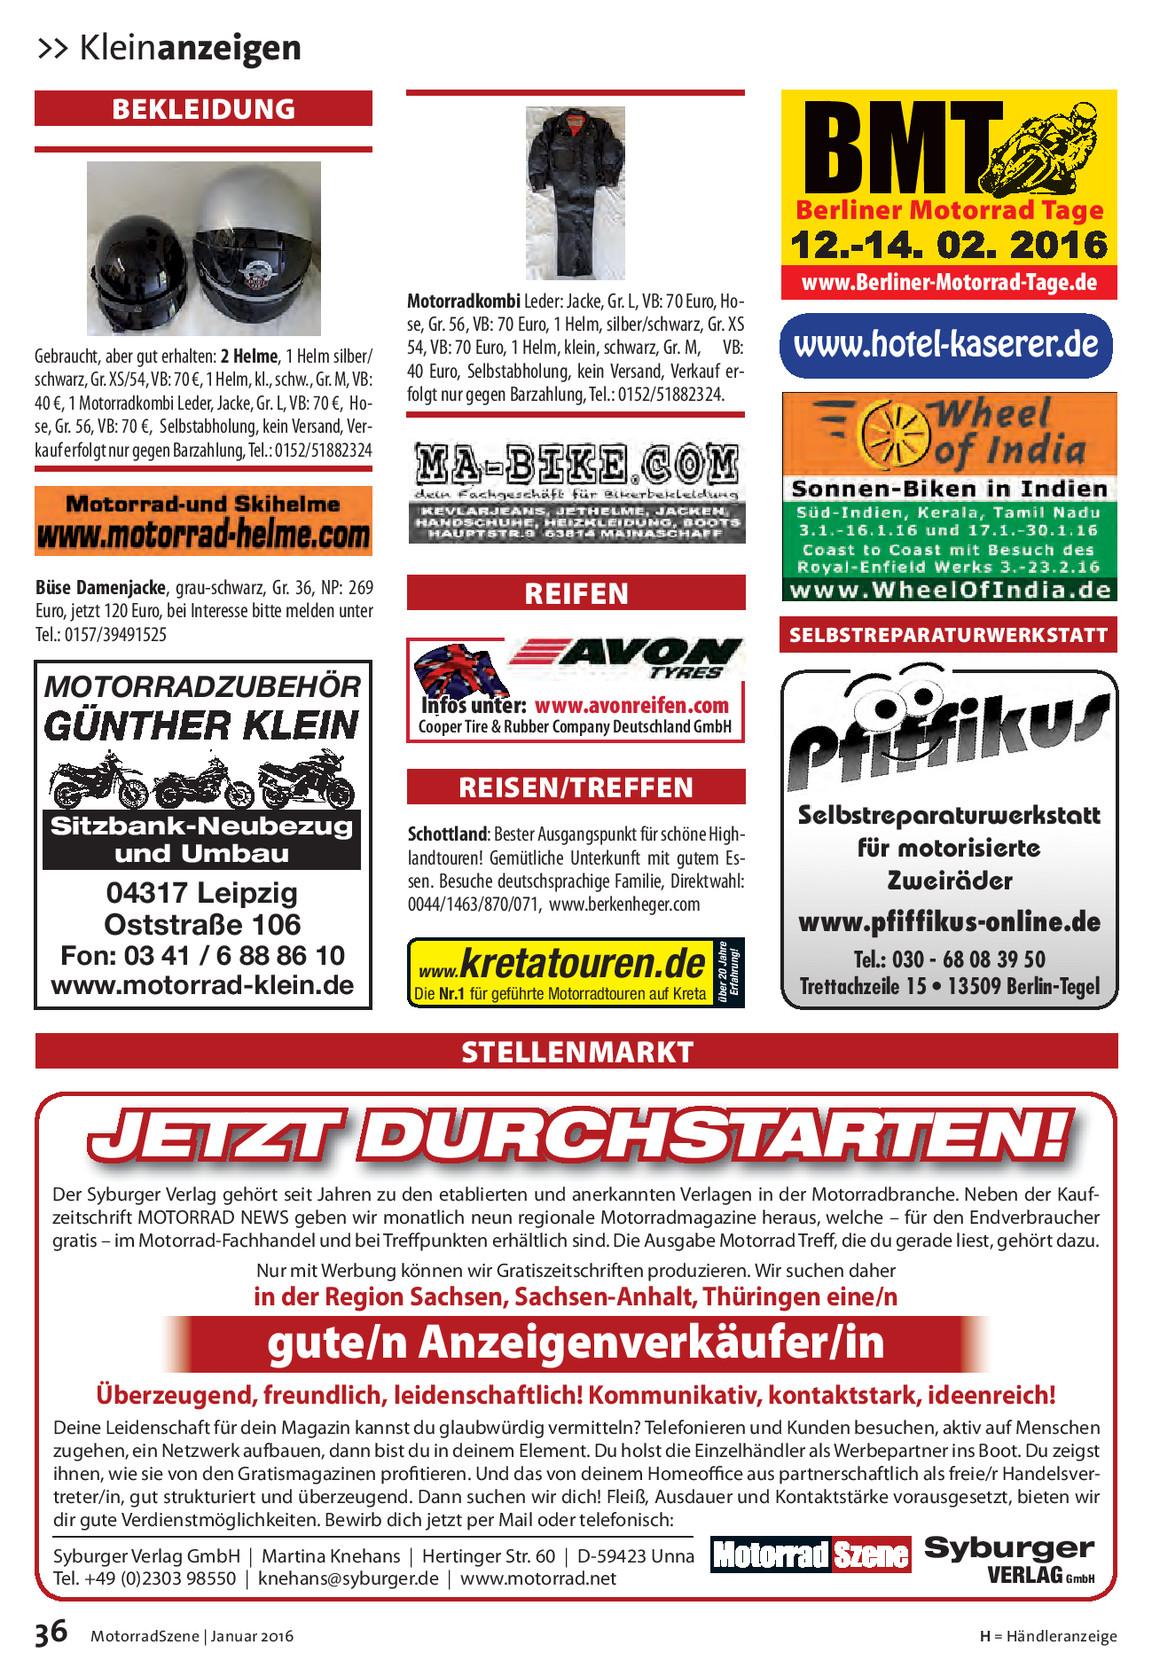 MotorradSzene Treff 0116   MotorradSzene